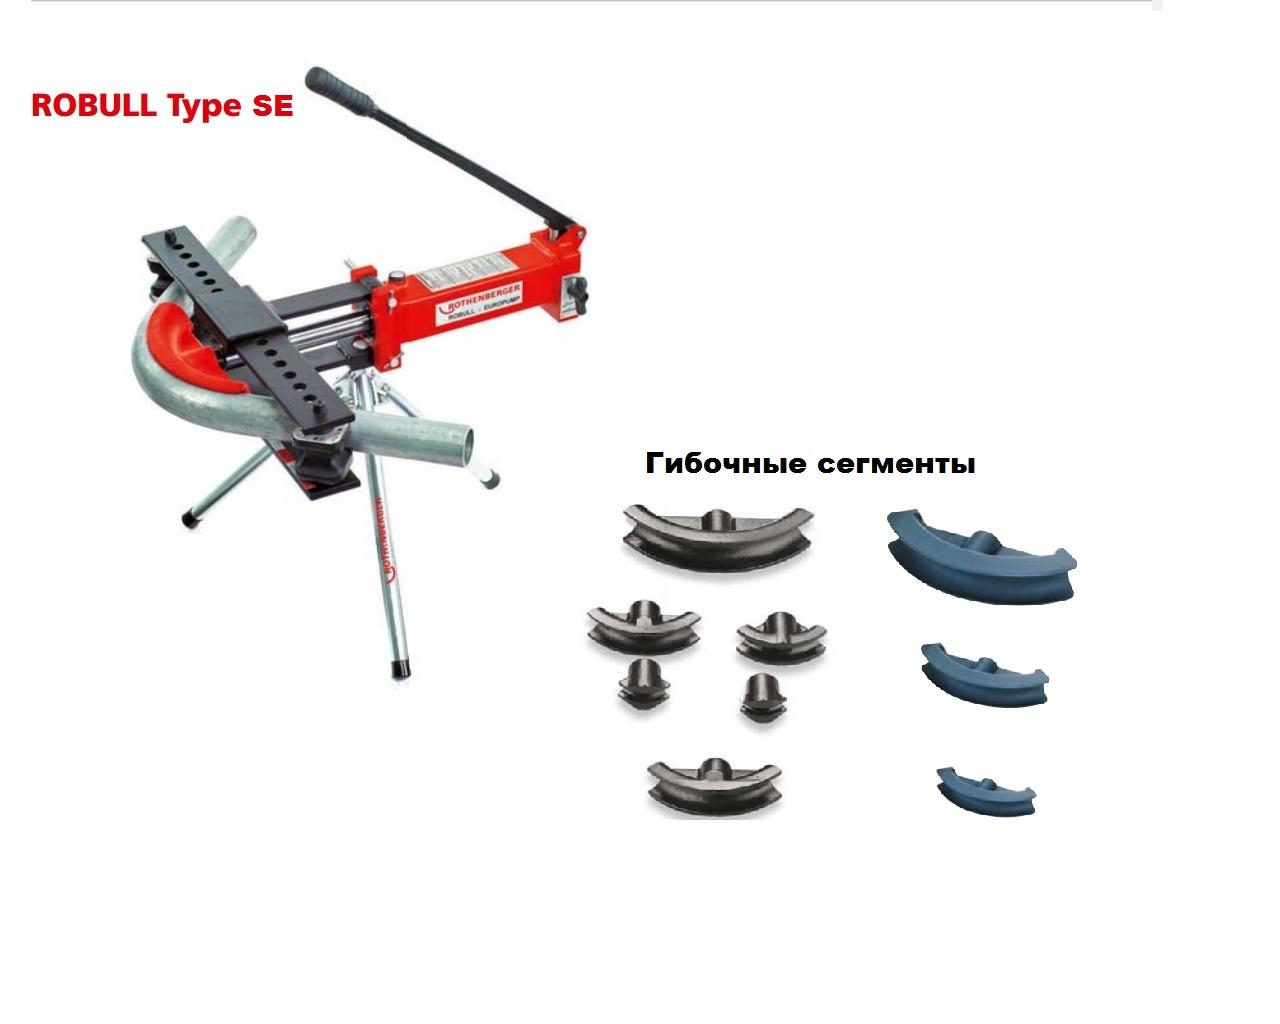 Трубогиб RothenbergerТрубогибы, расширители<br>Тип: трубогиб,<br>Макс. диаметр трубы: 59.6,<br>Мин. диаметр трубы: 16.6,<br>Привод: гидравлический<br>